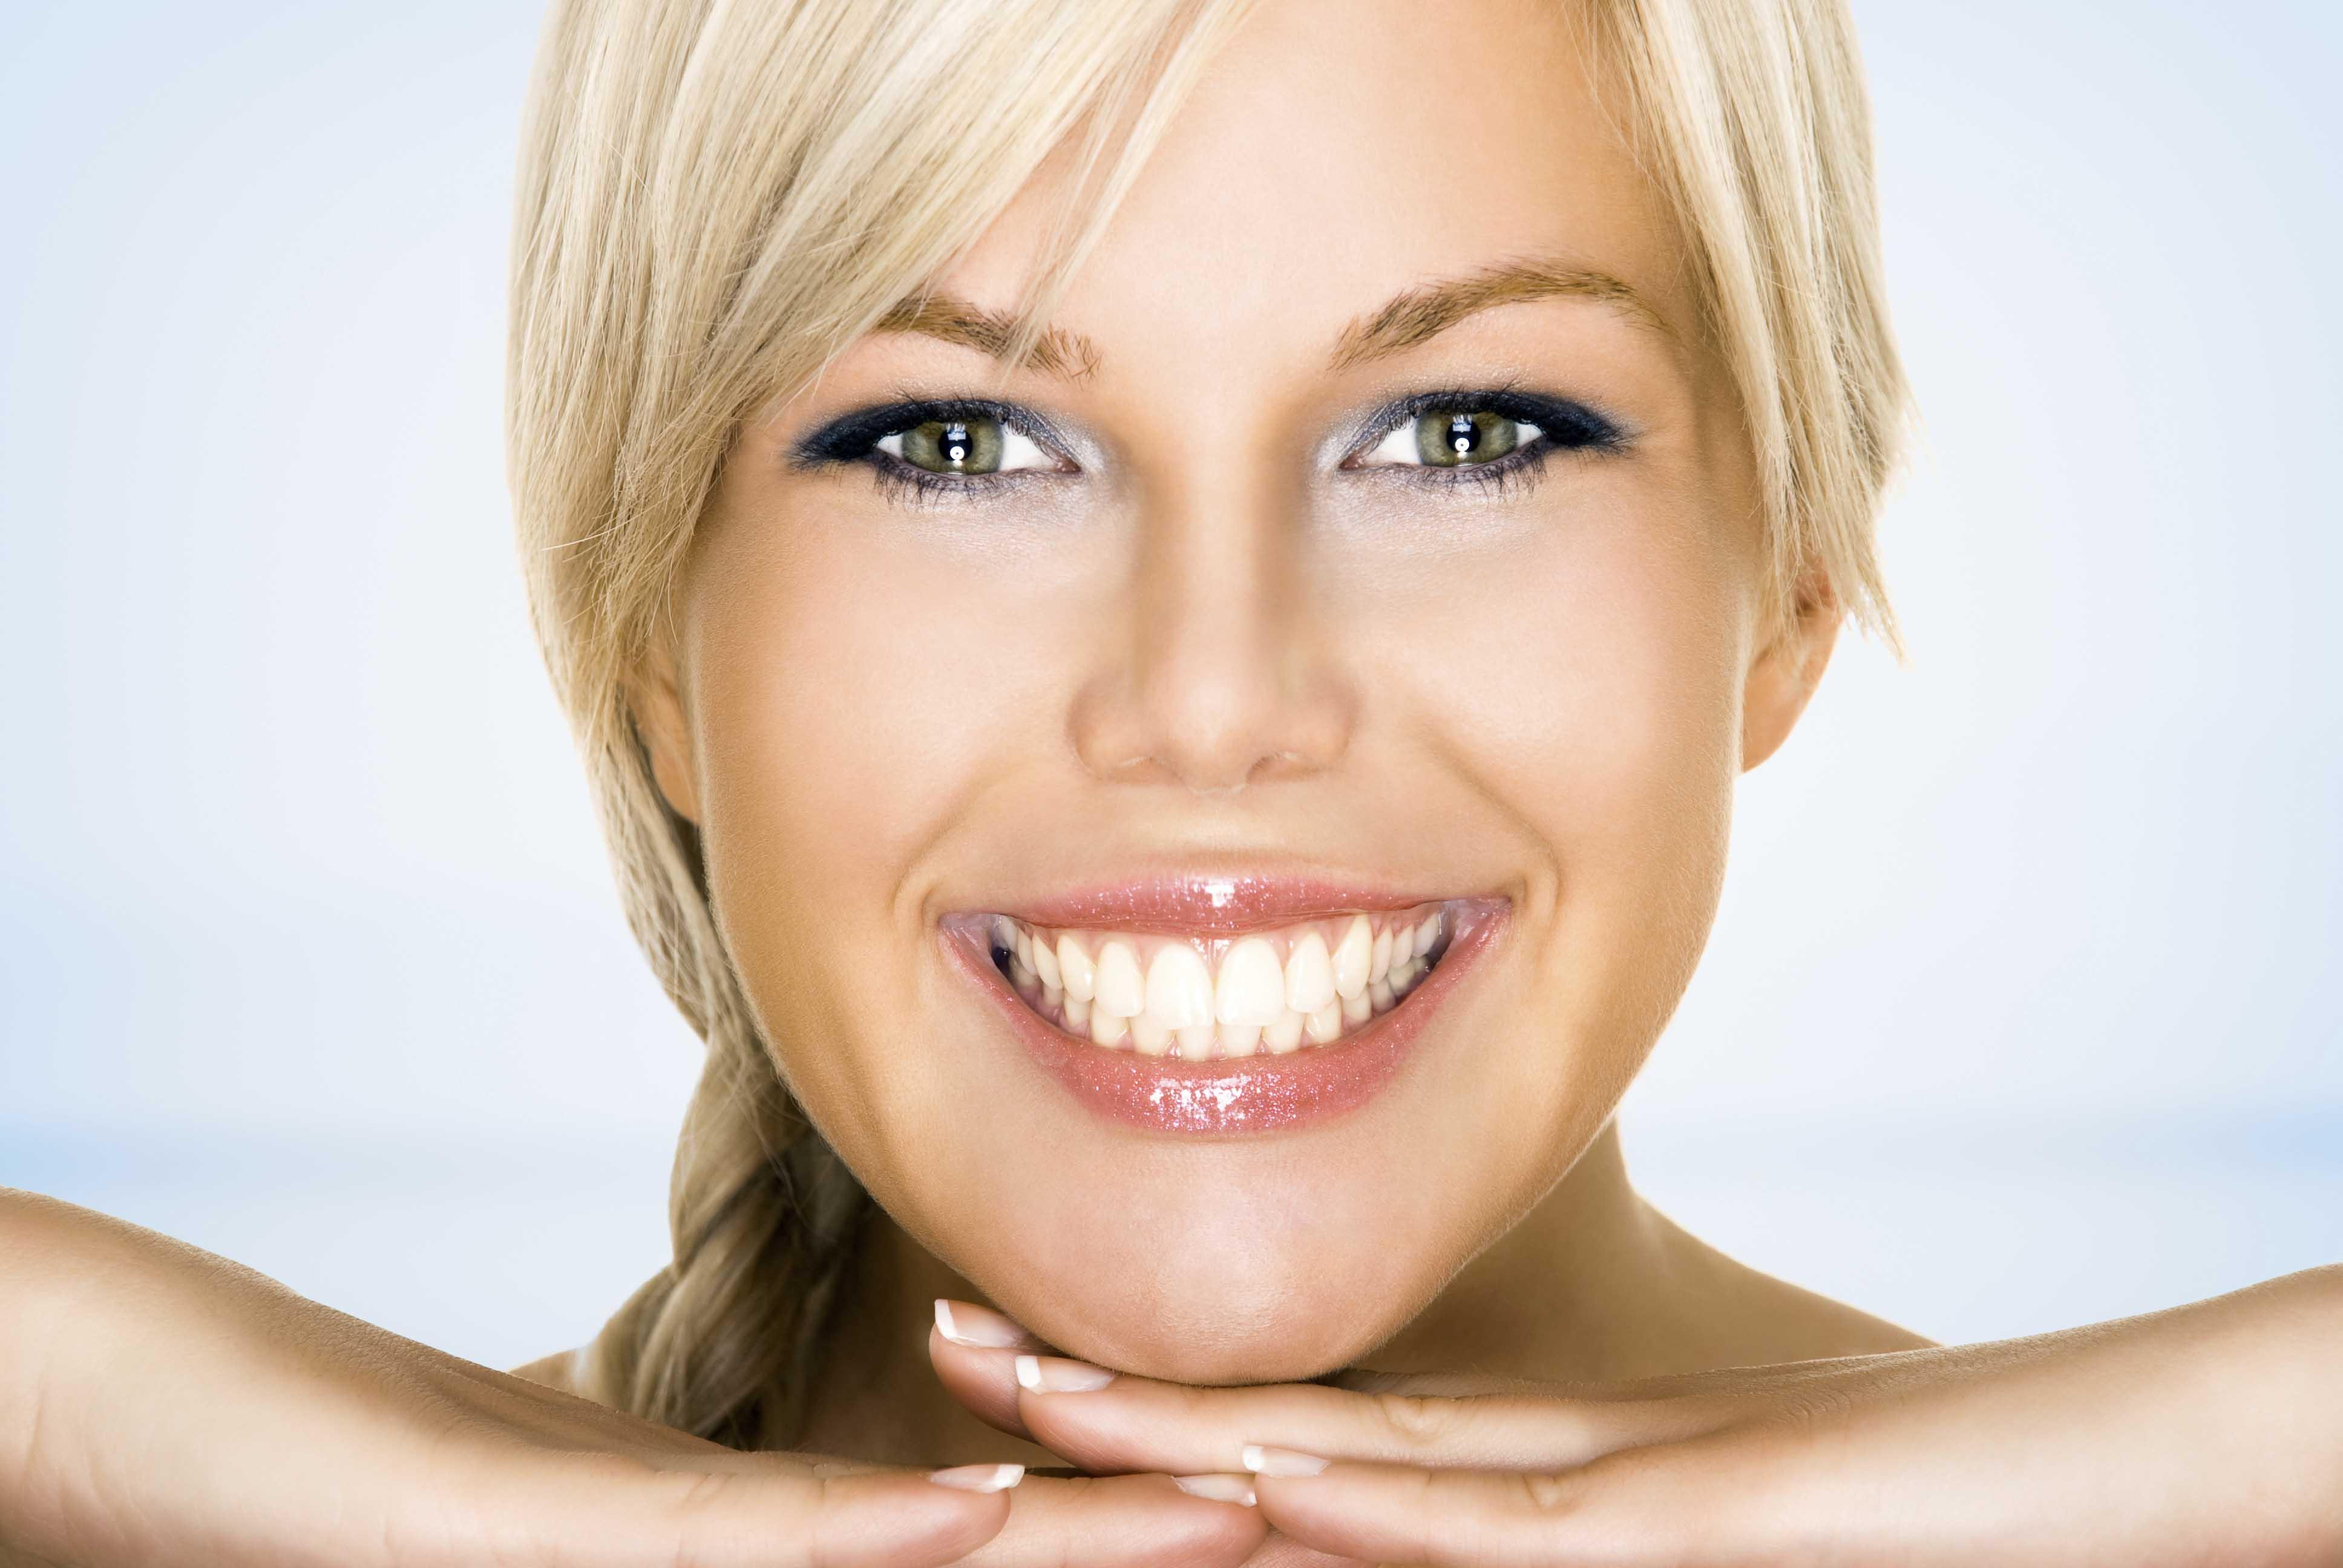 Preventative dentistry_1329229258_2